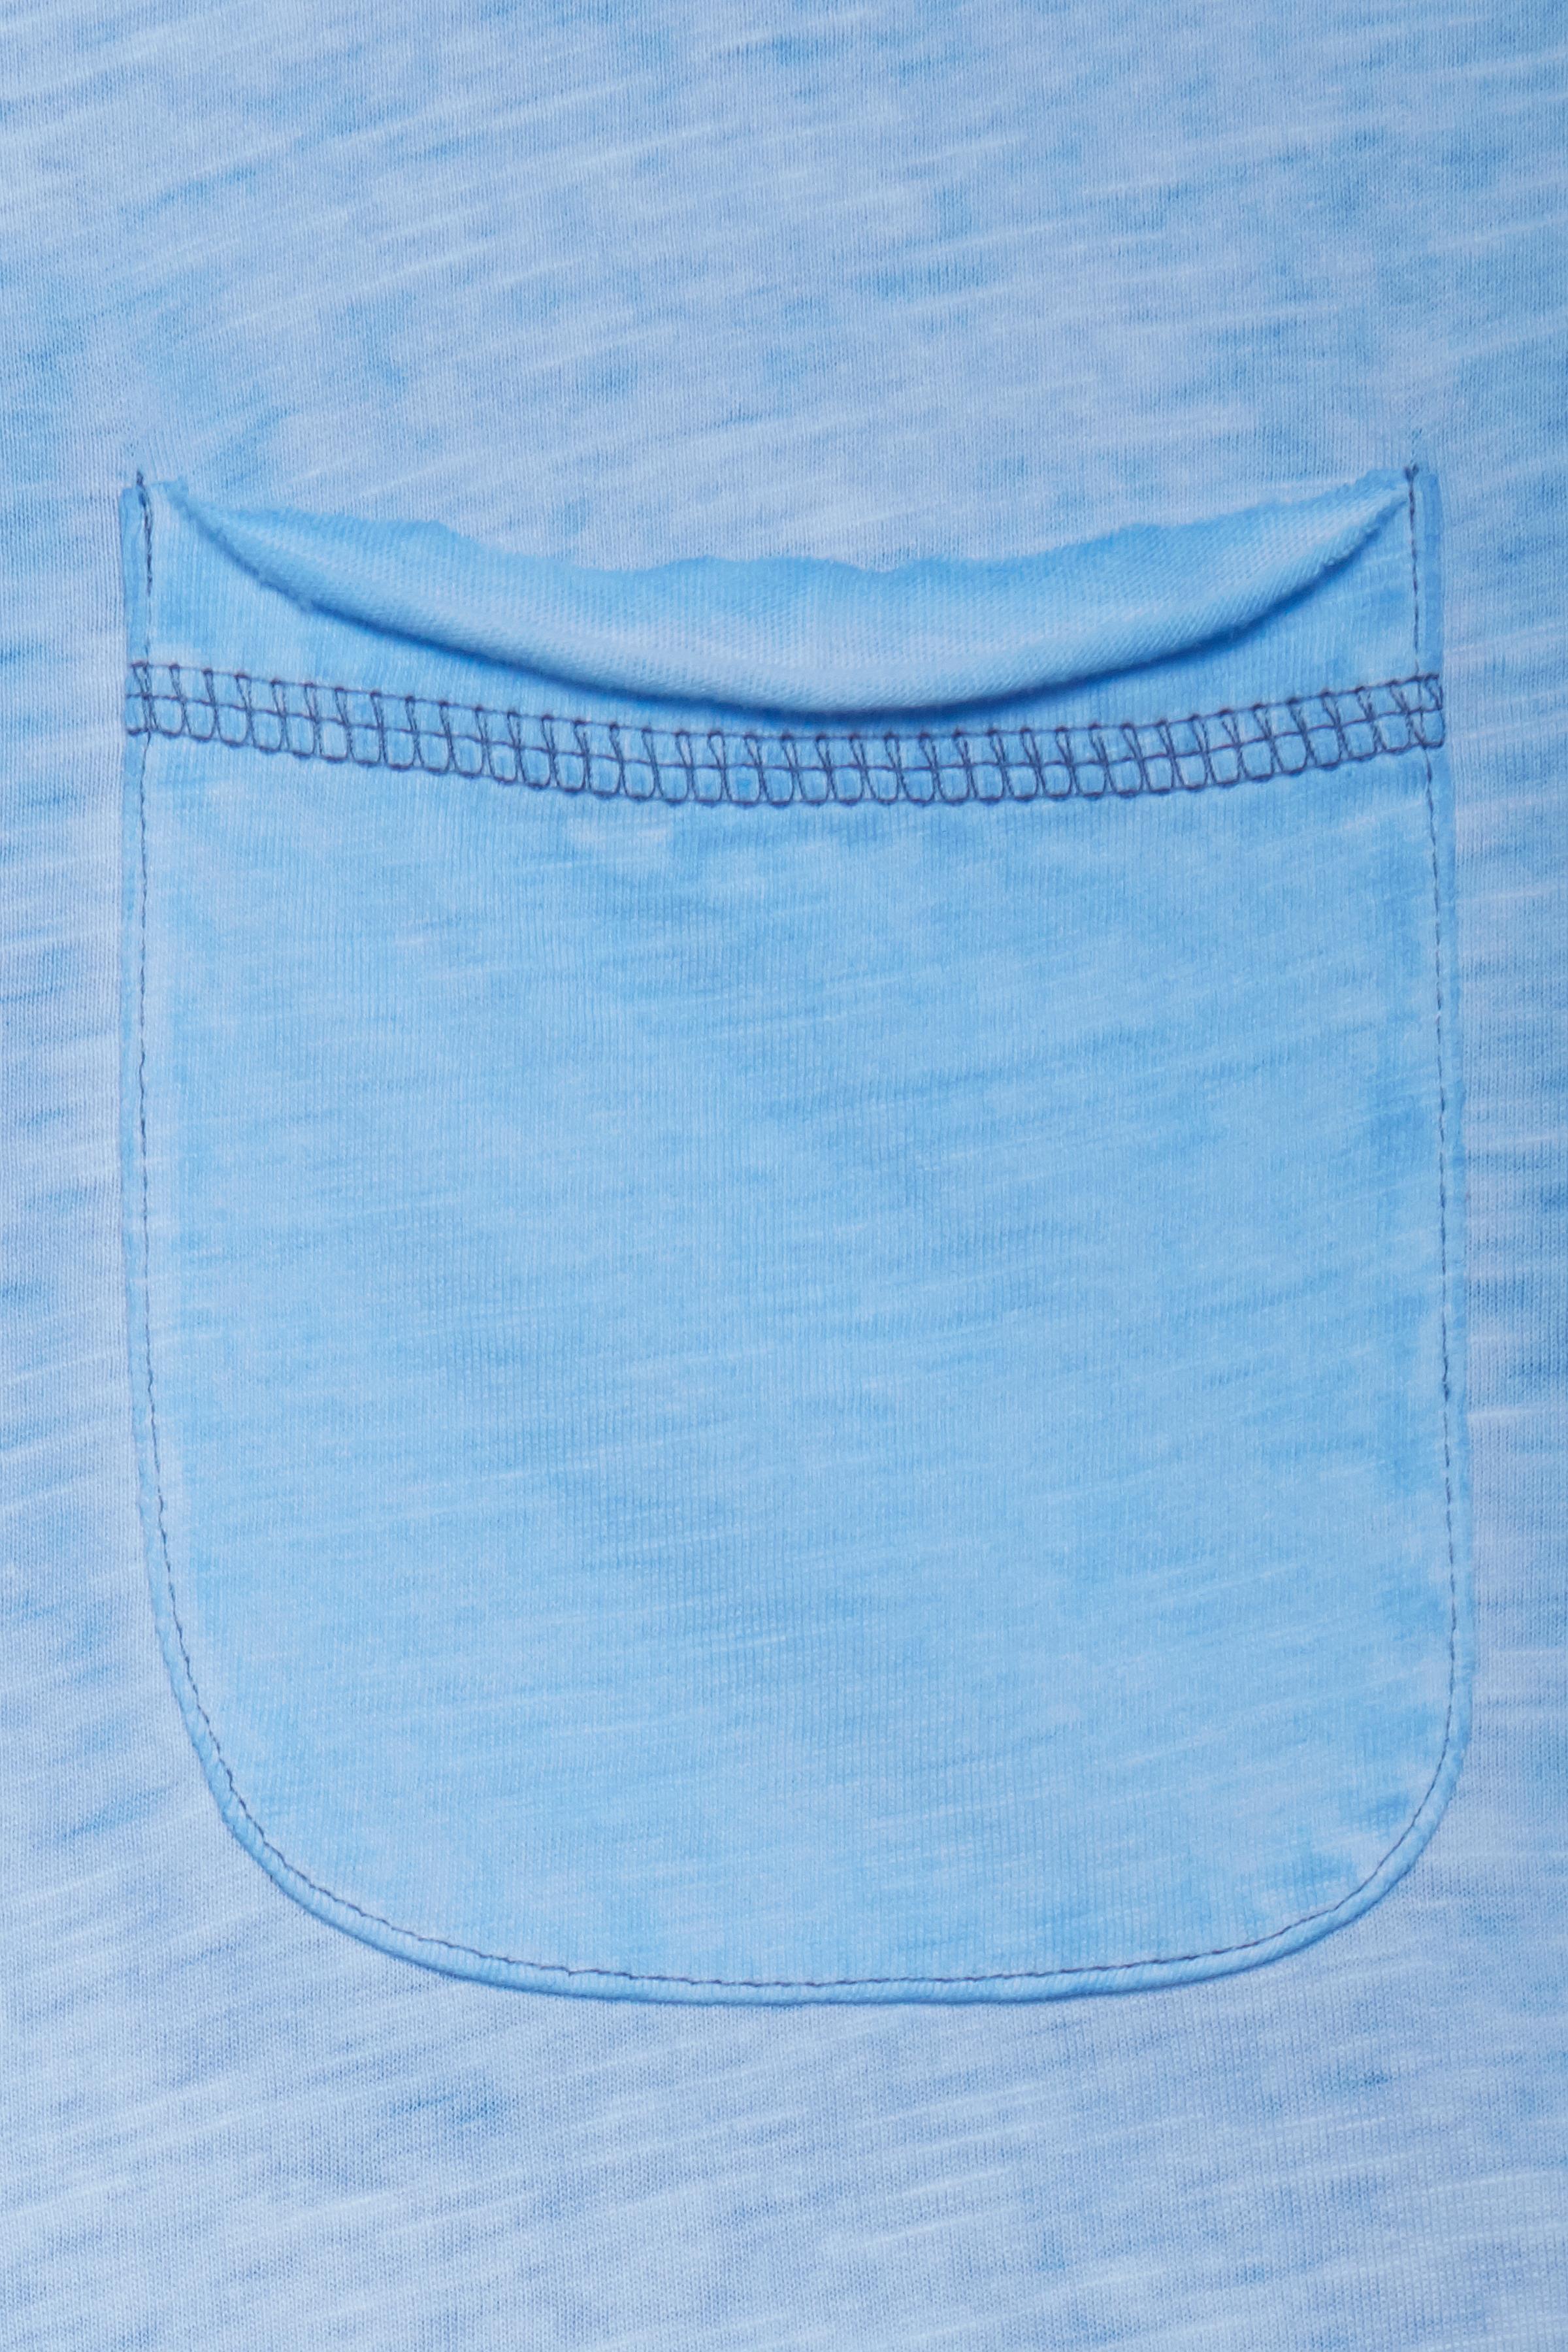 Marina Blue T-shirt – Køb Marina Blue T-shirt fra str. S-XL her